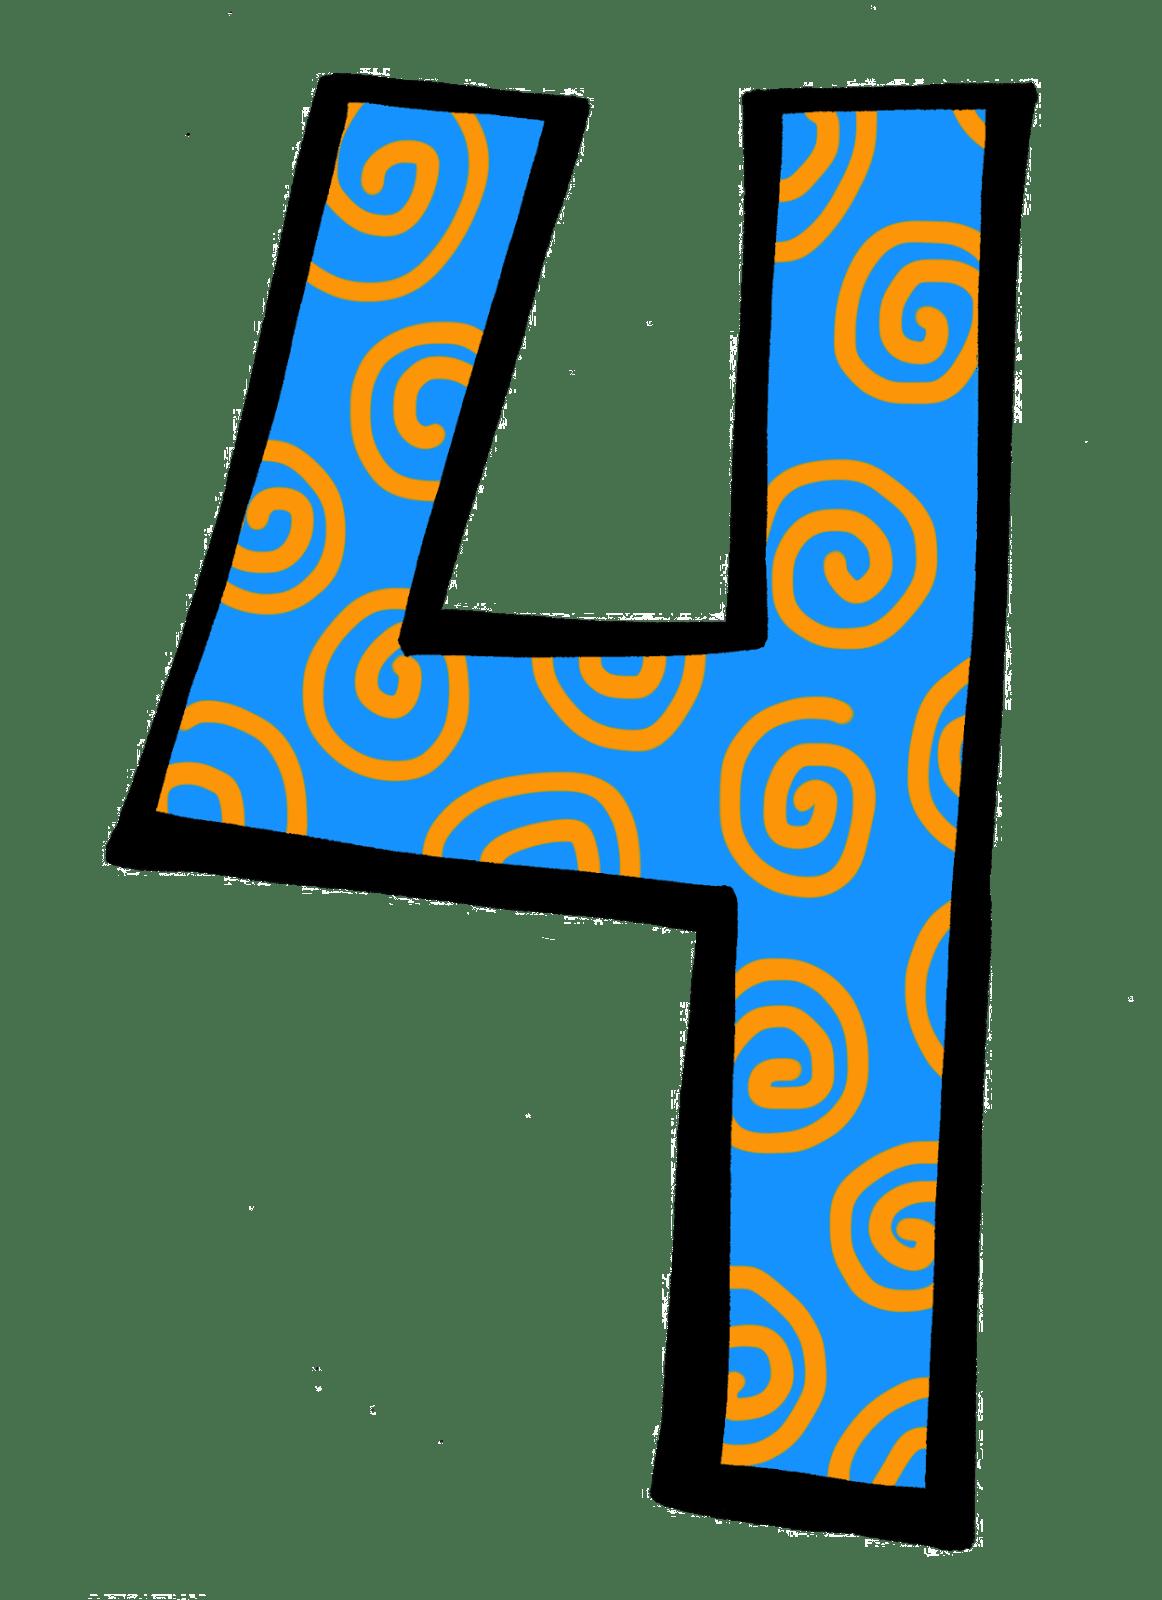 3 clipart number 4. Portal